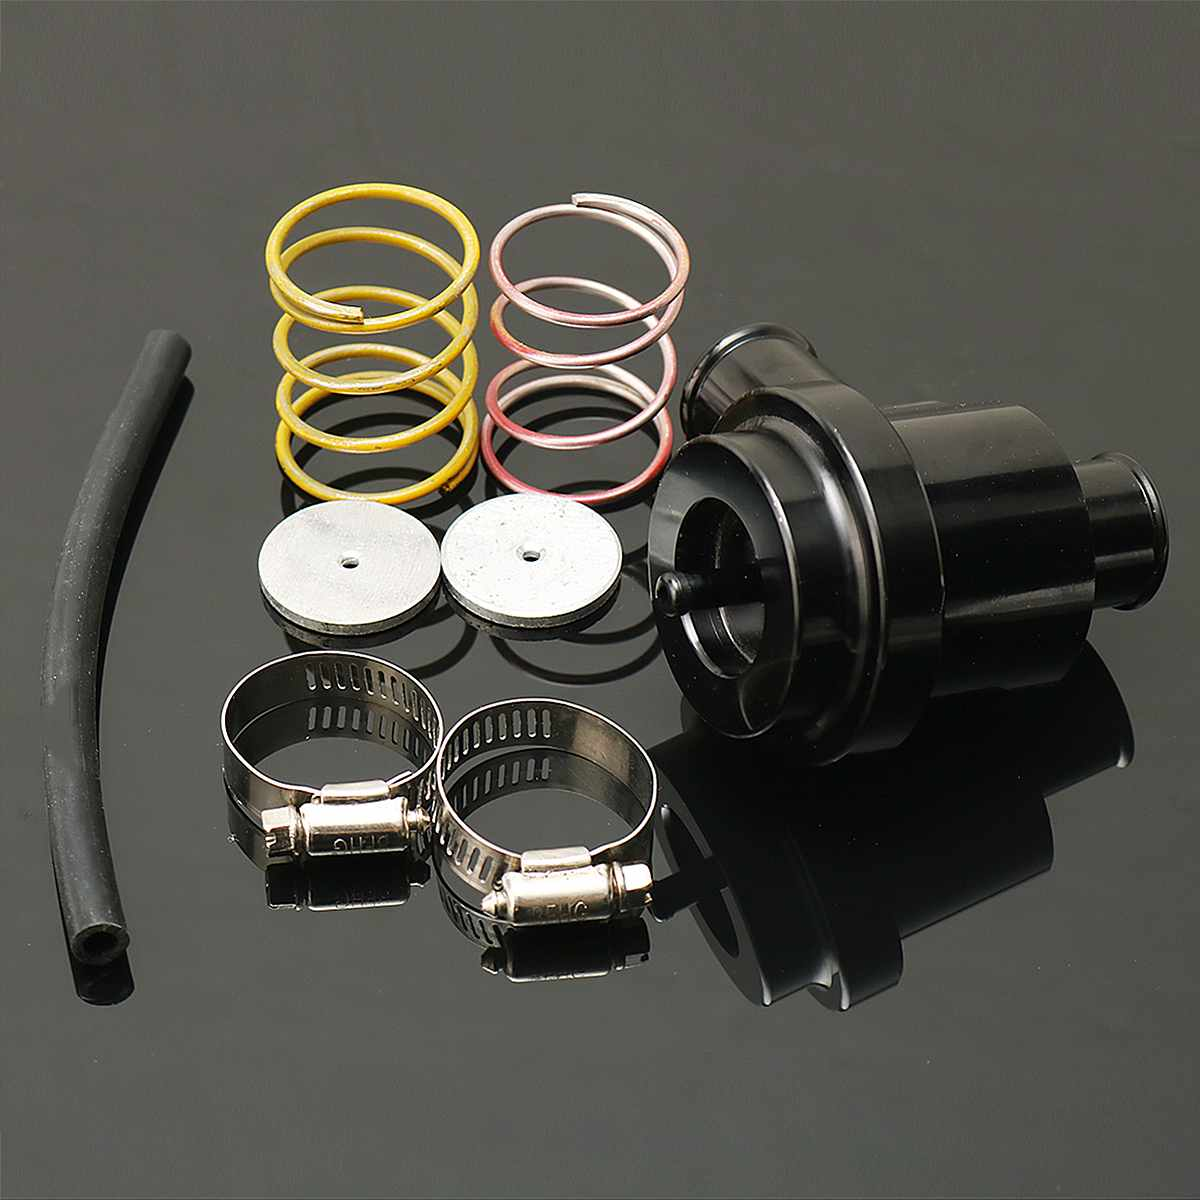 For Volkswagen Golf Jetta 2000-2005 For Audi 1.8T 2.7T 1998-2006 Black Aluminum Recirculate Diverter Valve Turbo BOV Boost